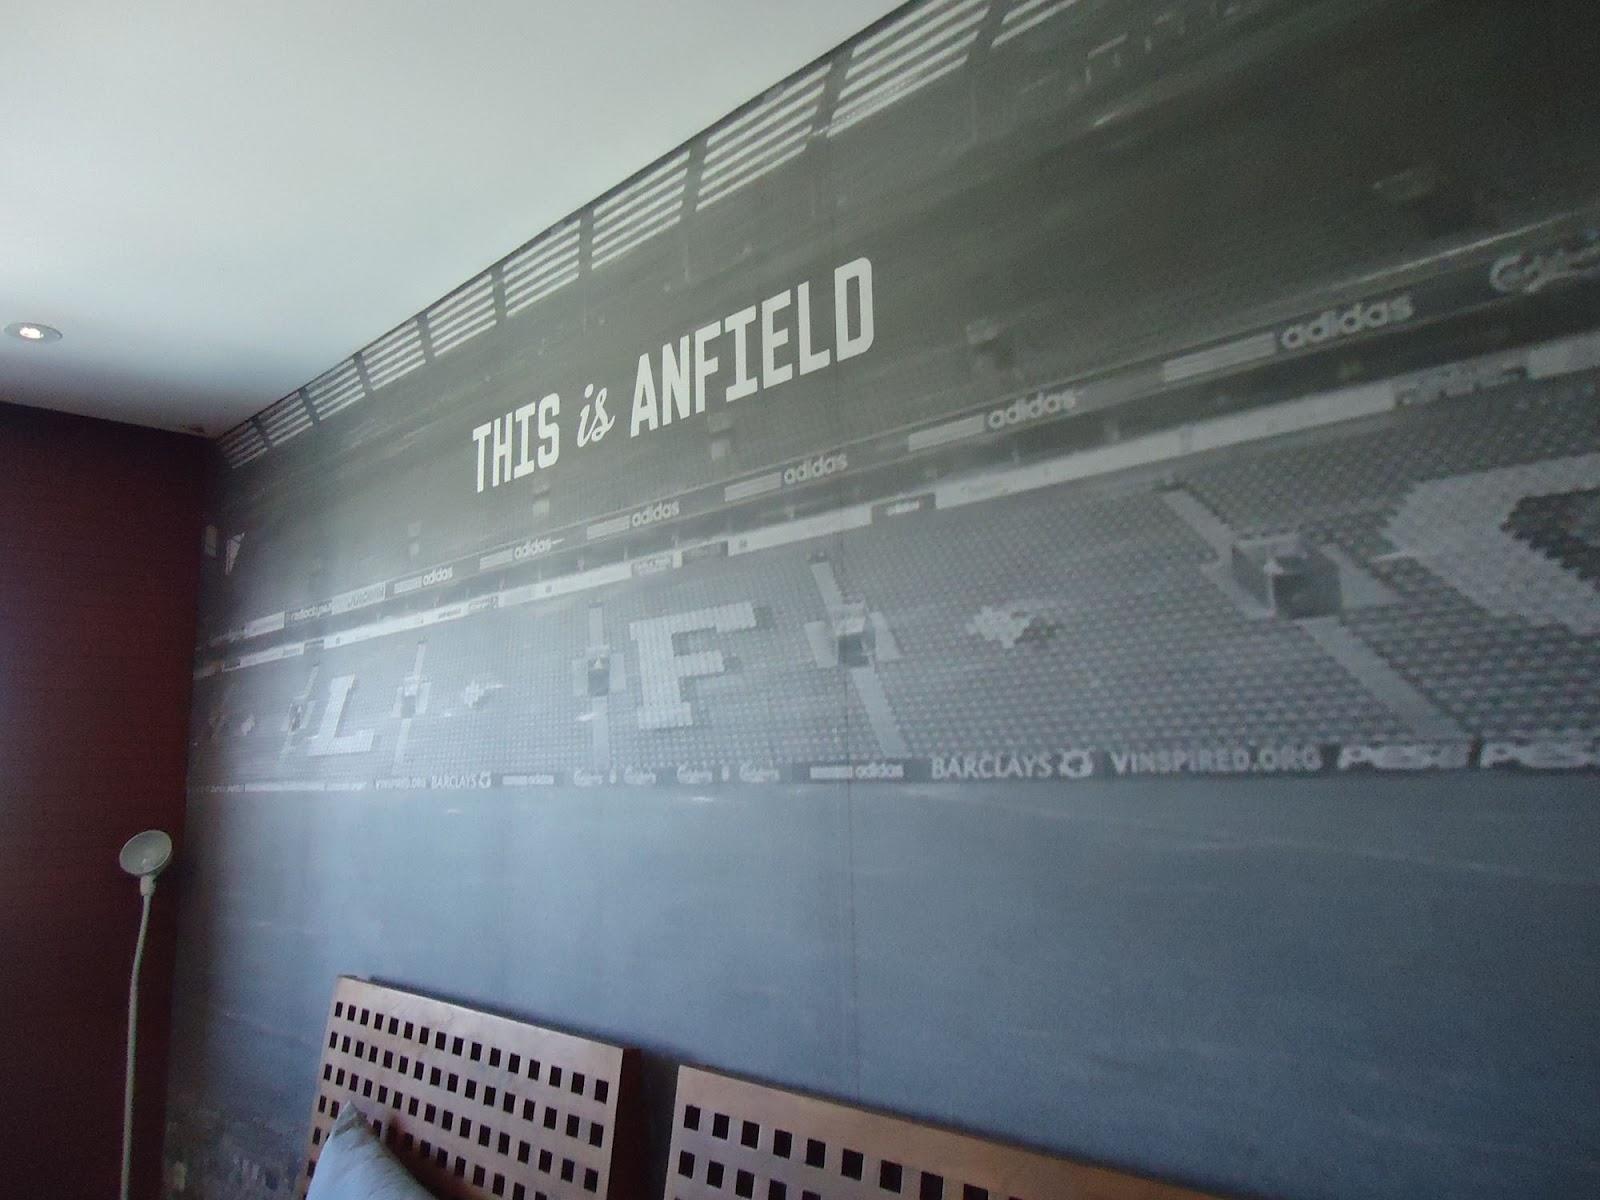 besar, kandang, sarangnya Liverpool, yaitu This Is Anfield room